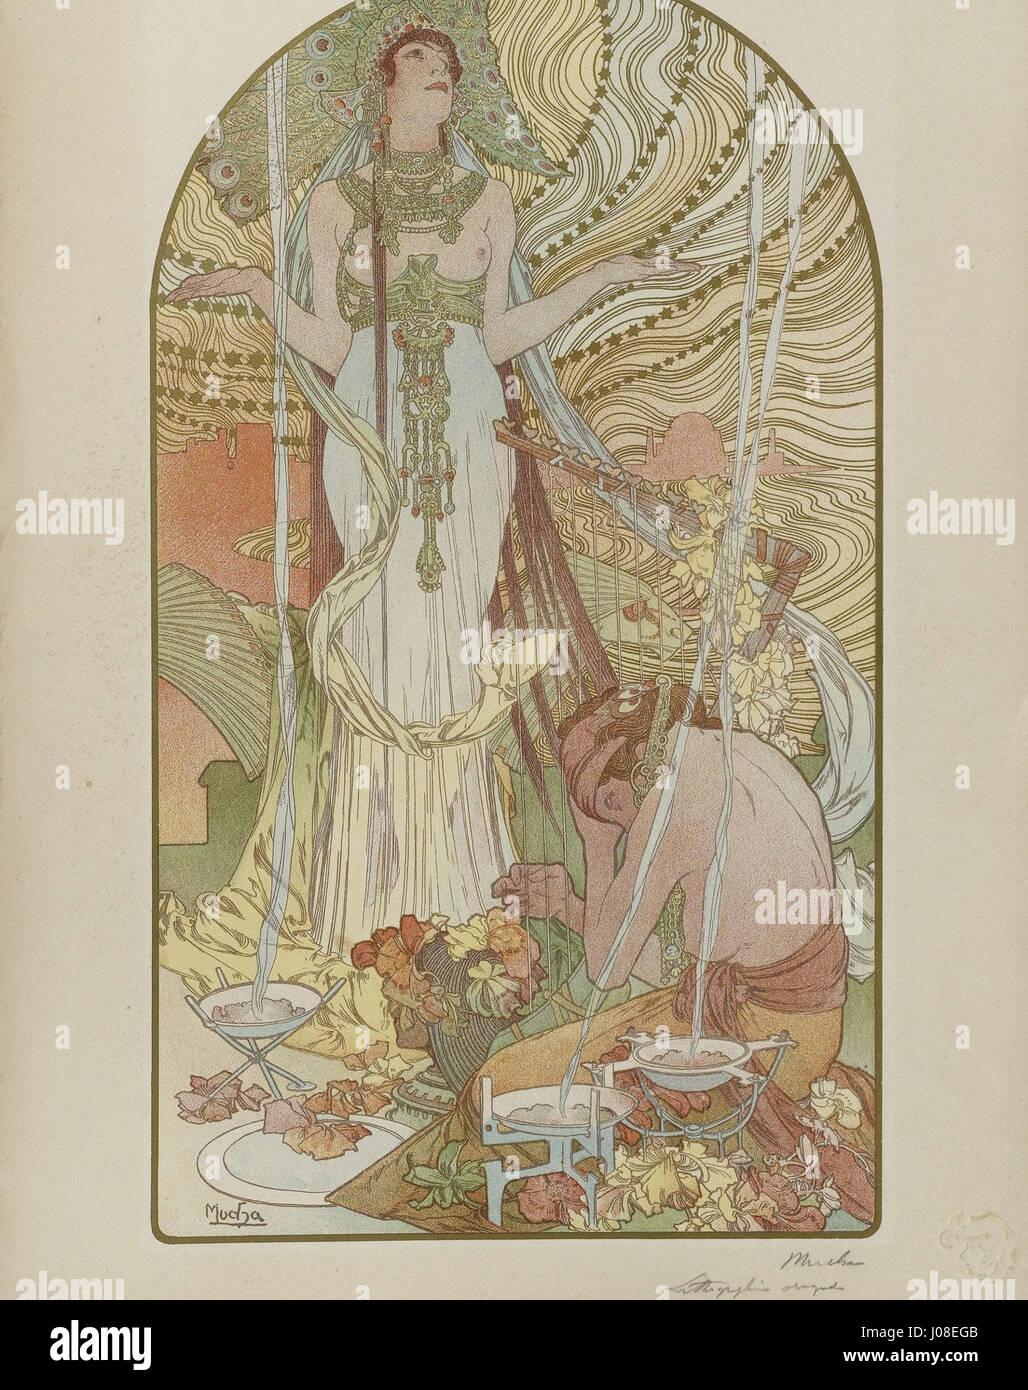 Alfons Mucha Salammbô 1897 - Stock Image